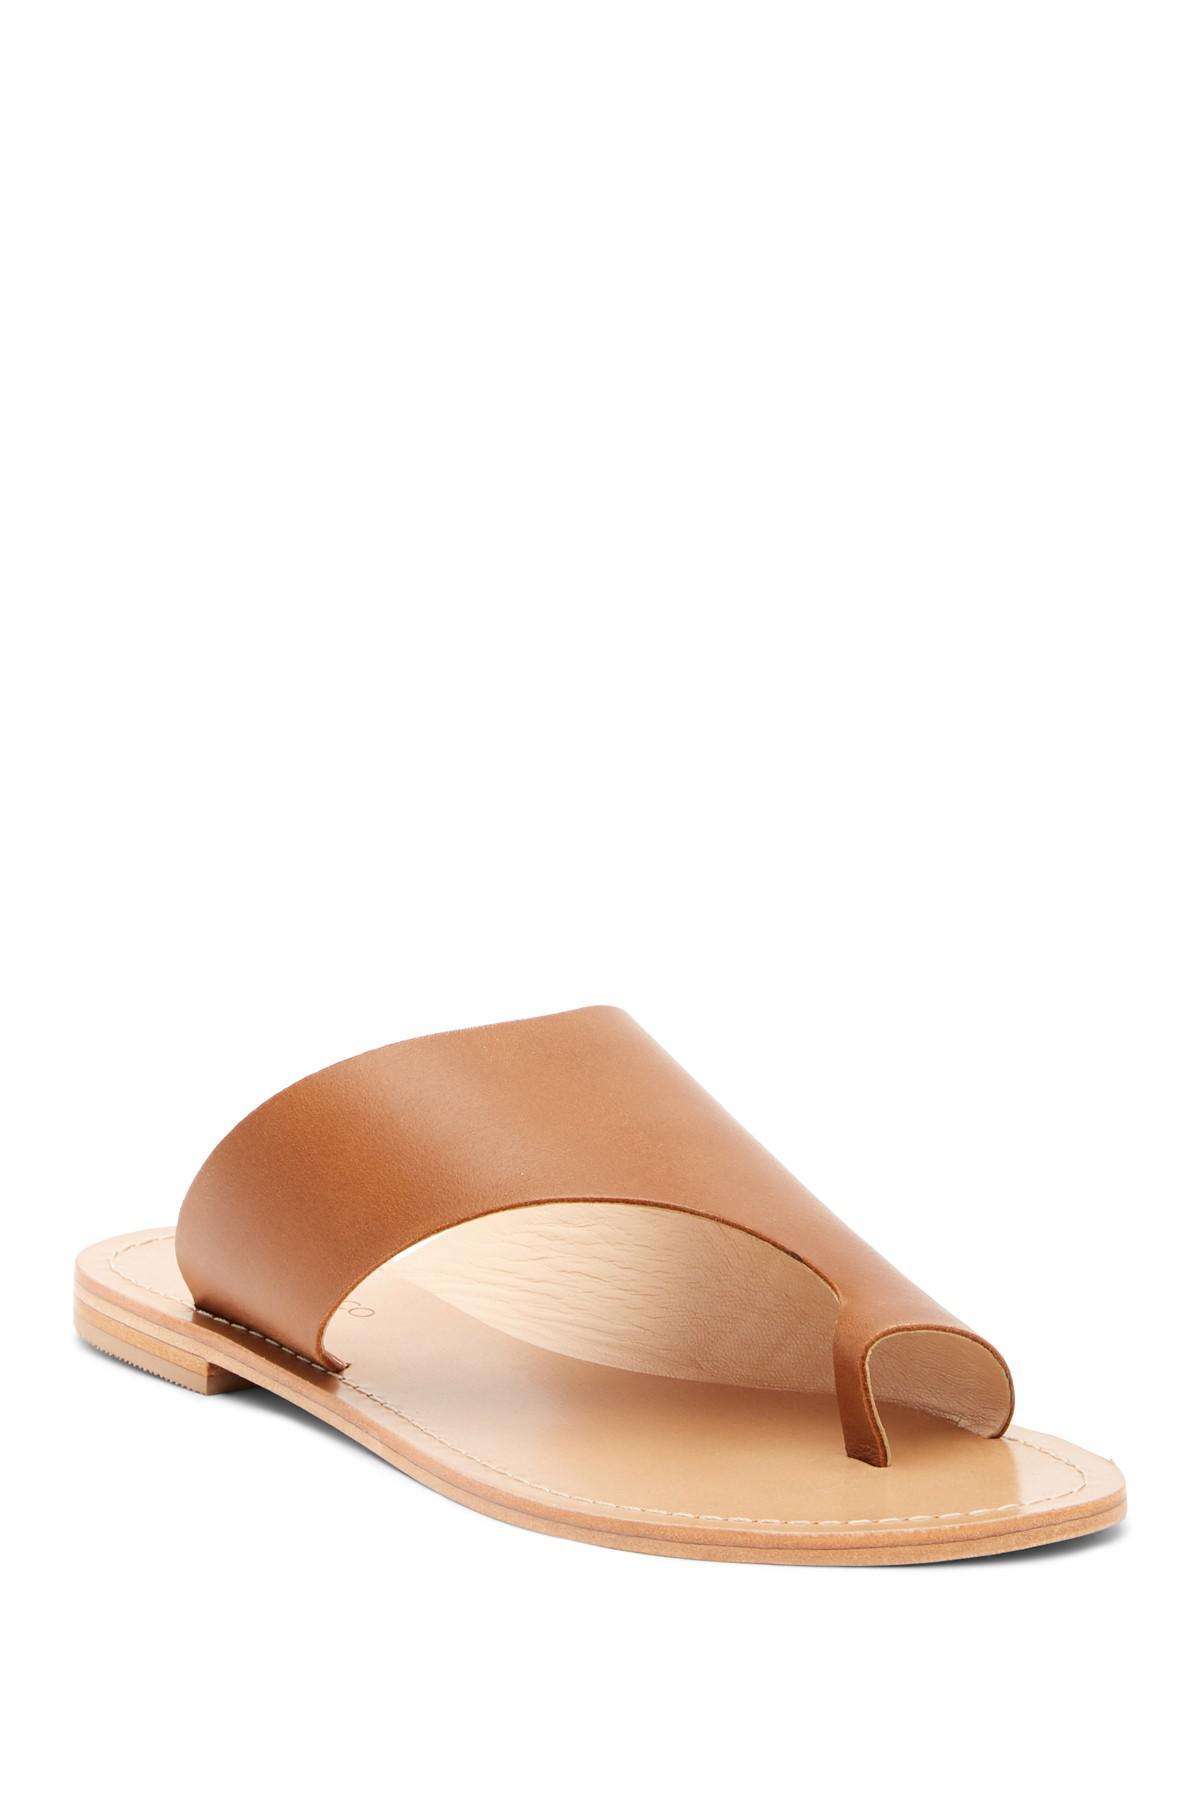 Tony Bianco Fleet Thong Slide Sandals gYmLV